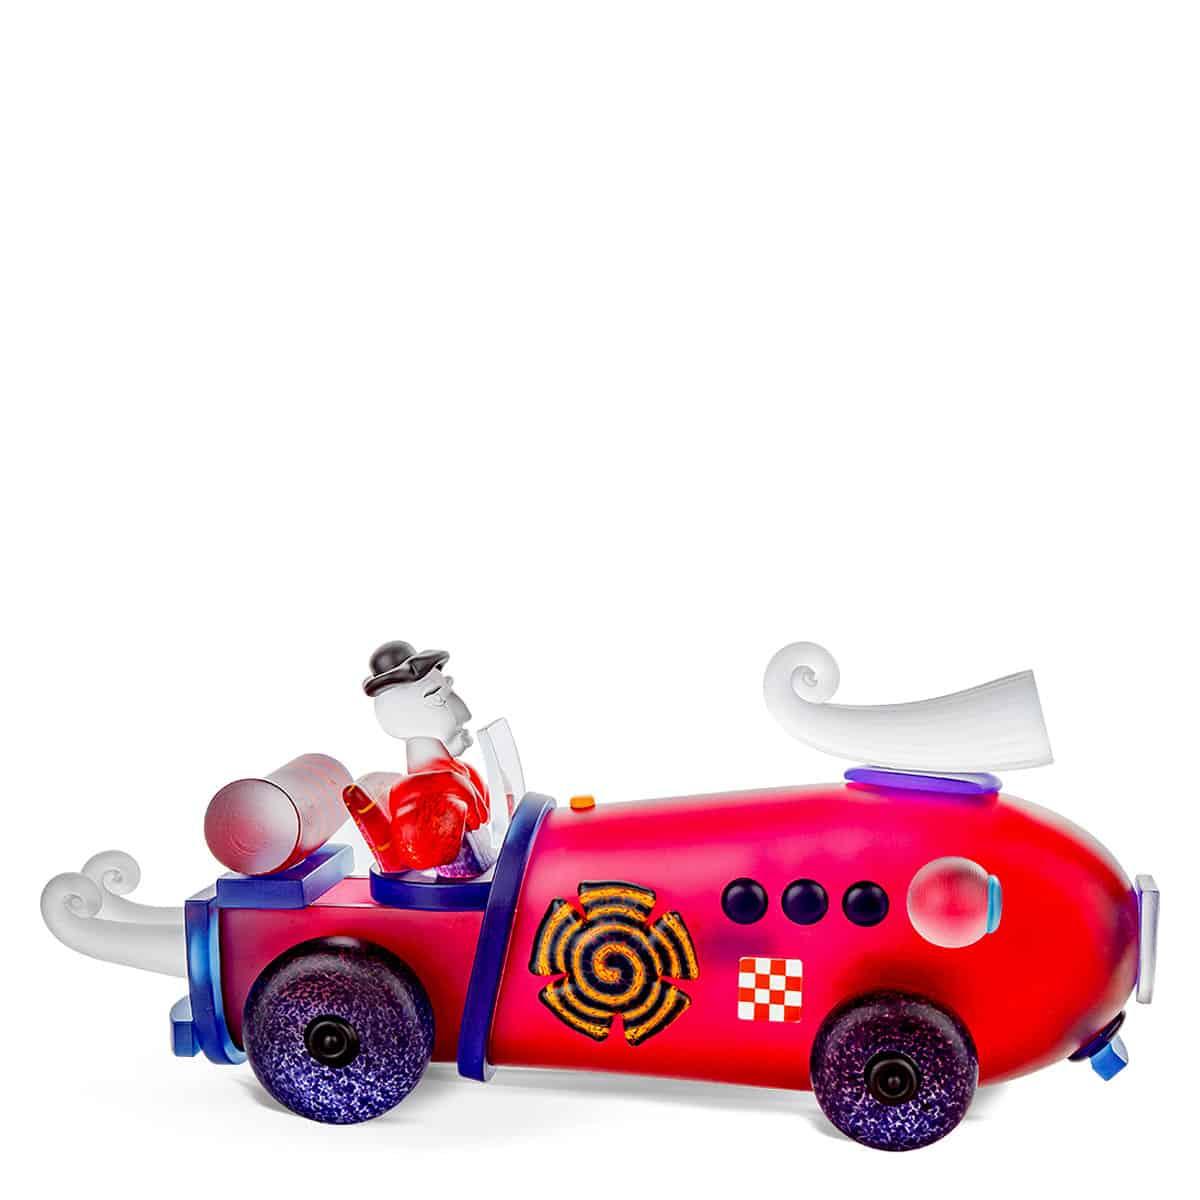 Retro Car - Borowski Objekt